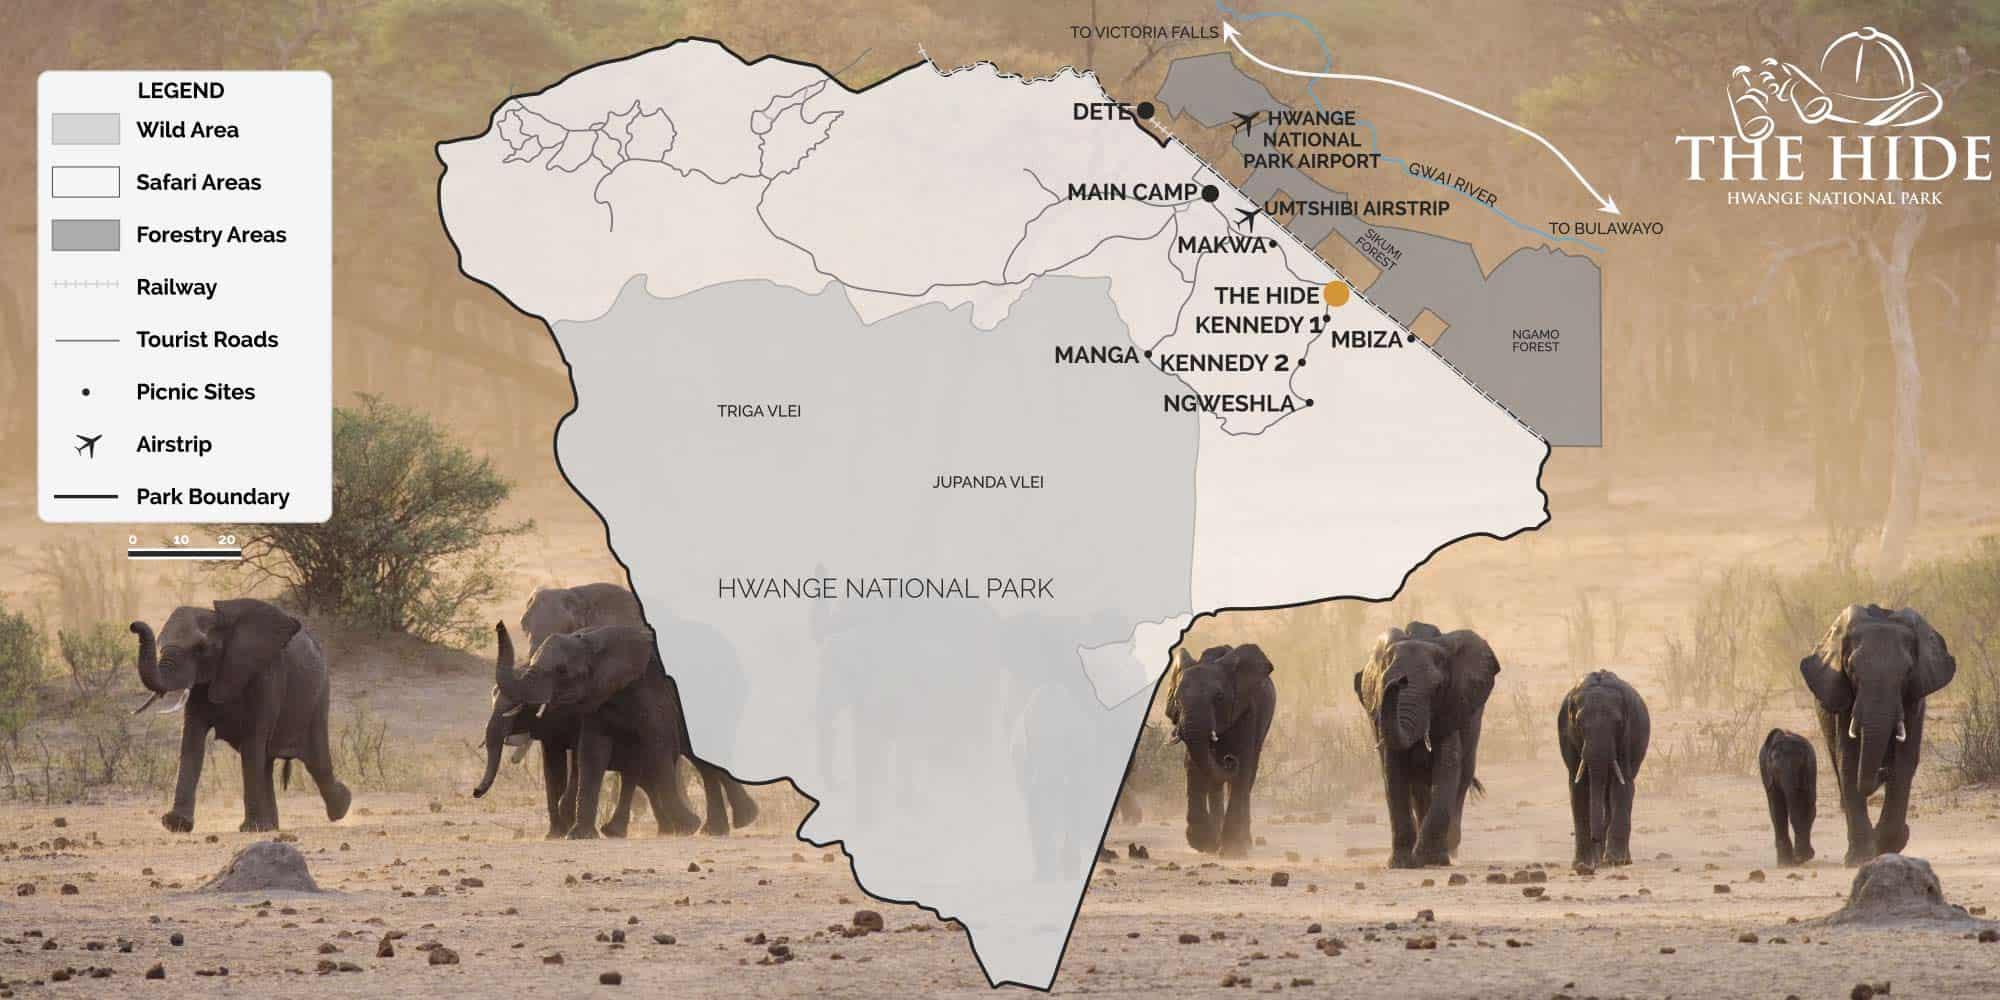 Hwange National Park Map The Hide